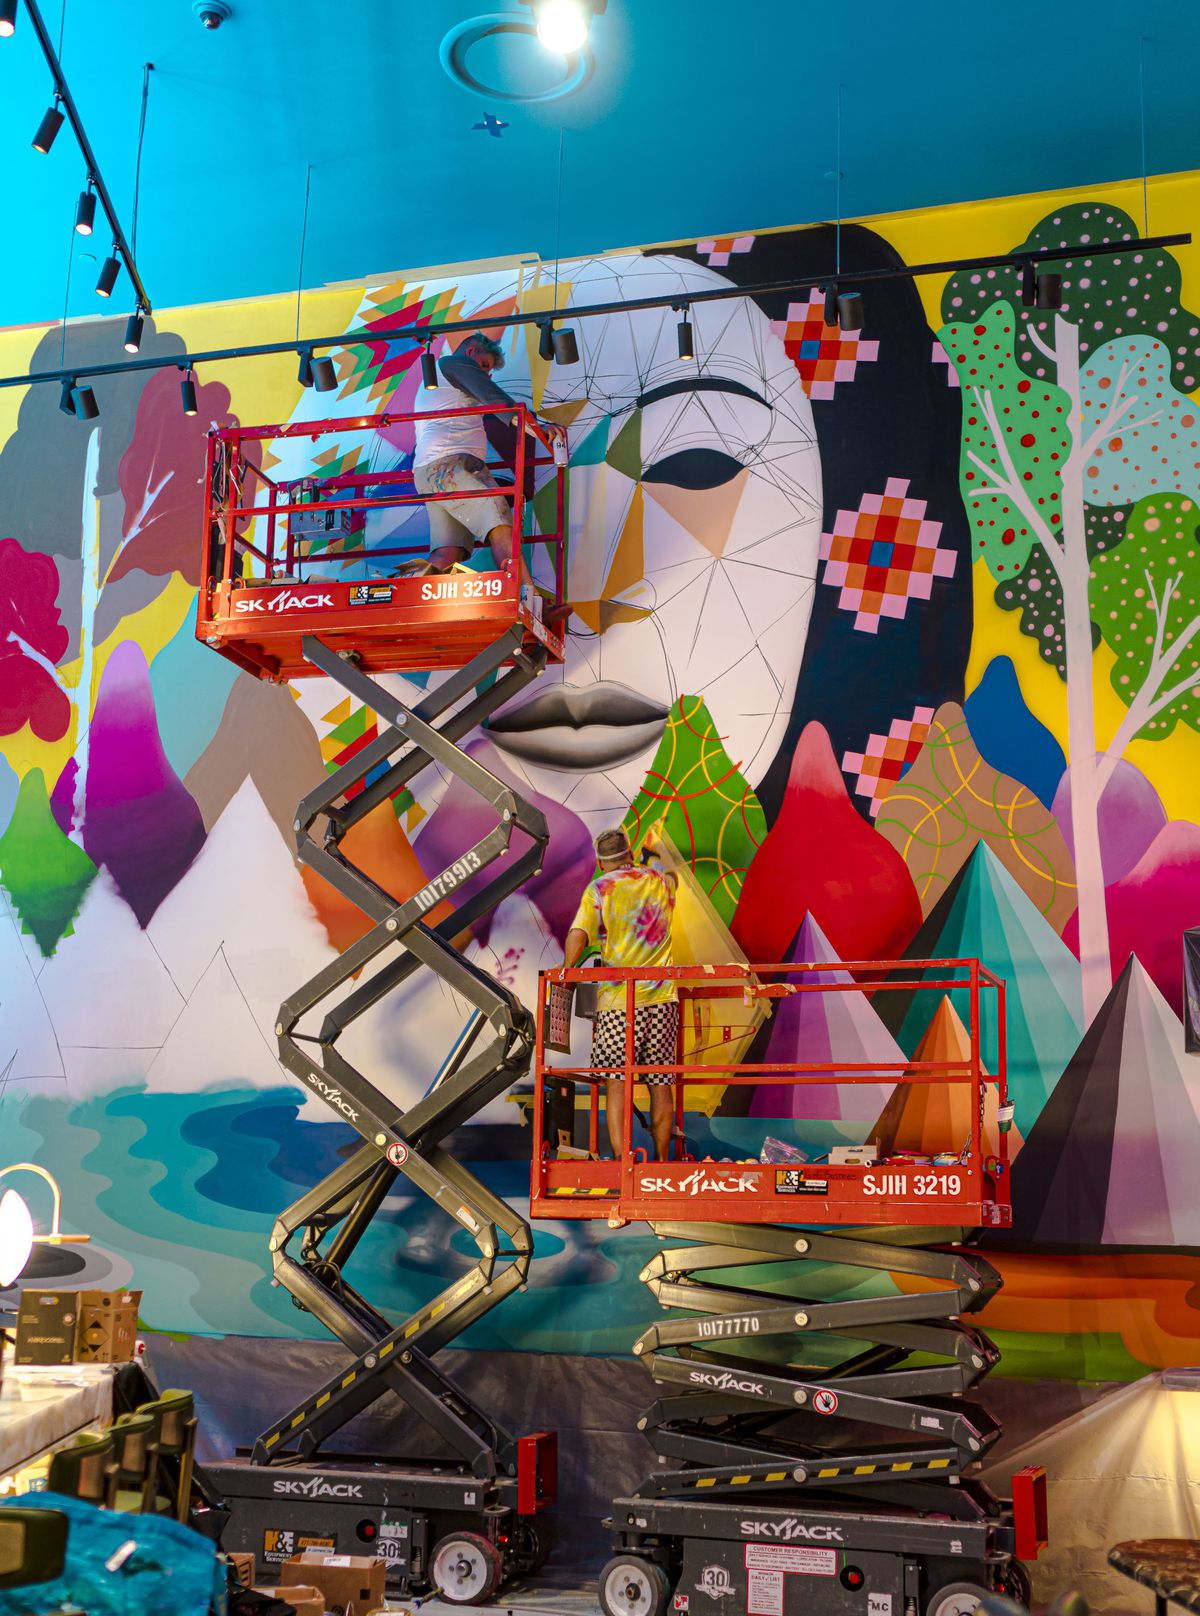 A man on a scissor lift paints a mural